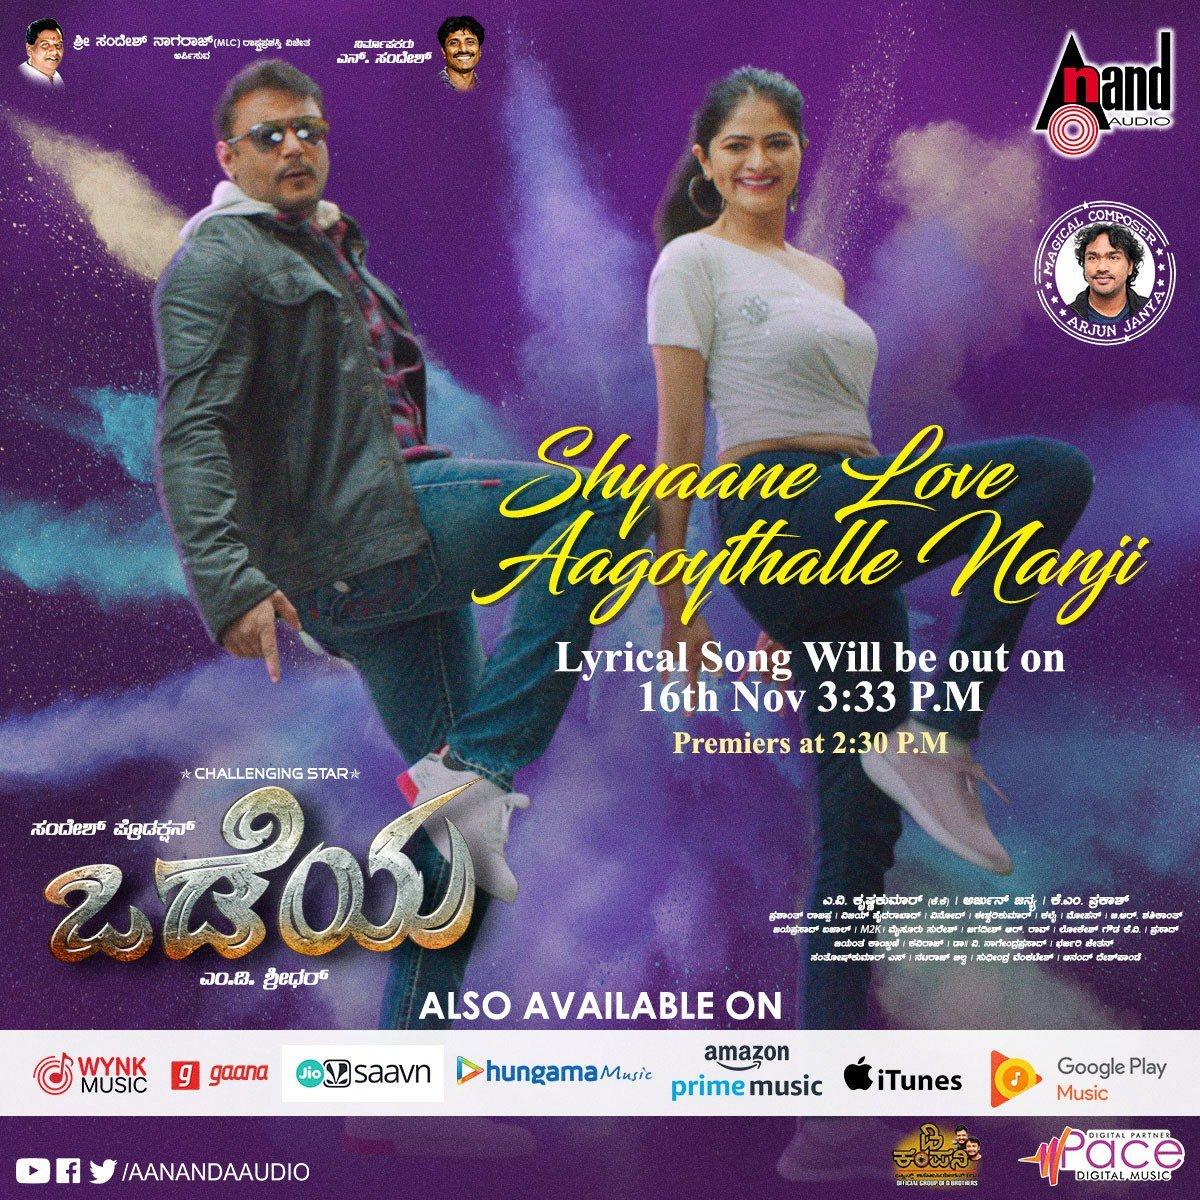 Kannada Movies On Twitter Challenging Star Darshan S Odeya Movie Shyaaneloveaagoythallenanji Lyrical Video Song Releasing On Nov 16th At 3 33pm Https T Co Qlfqoqsa7b Https T Co Urskwsdunr